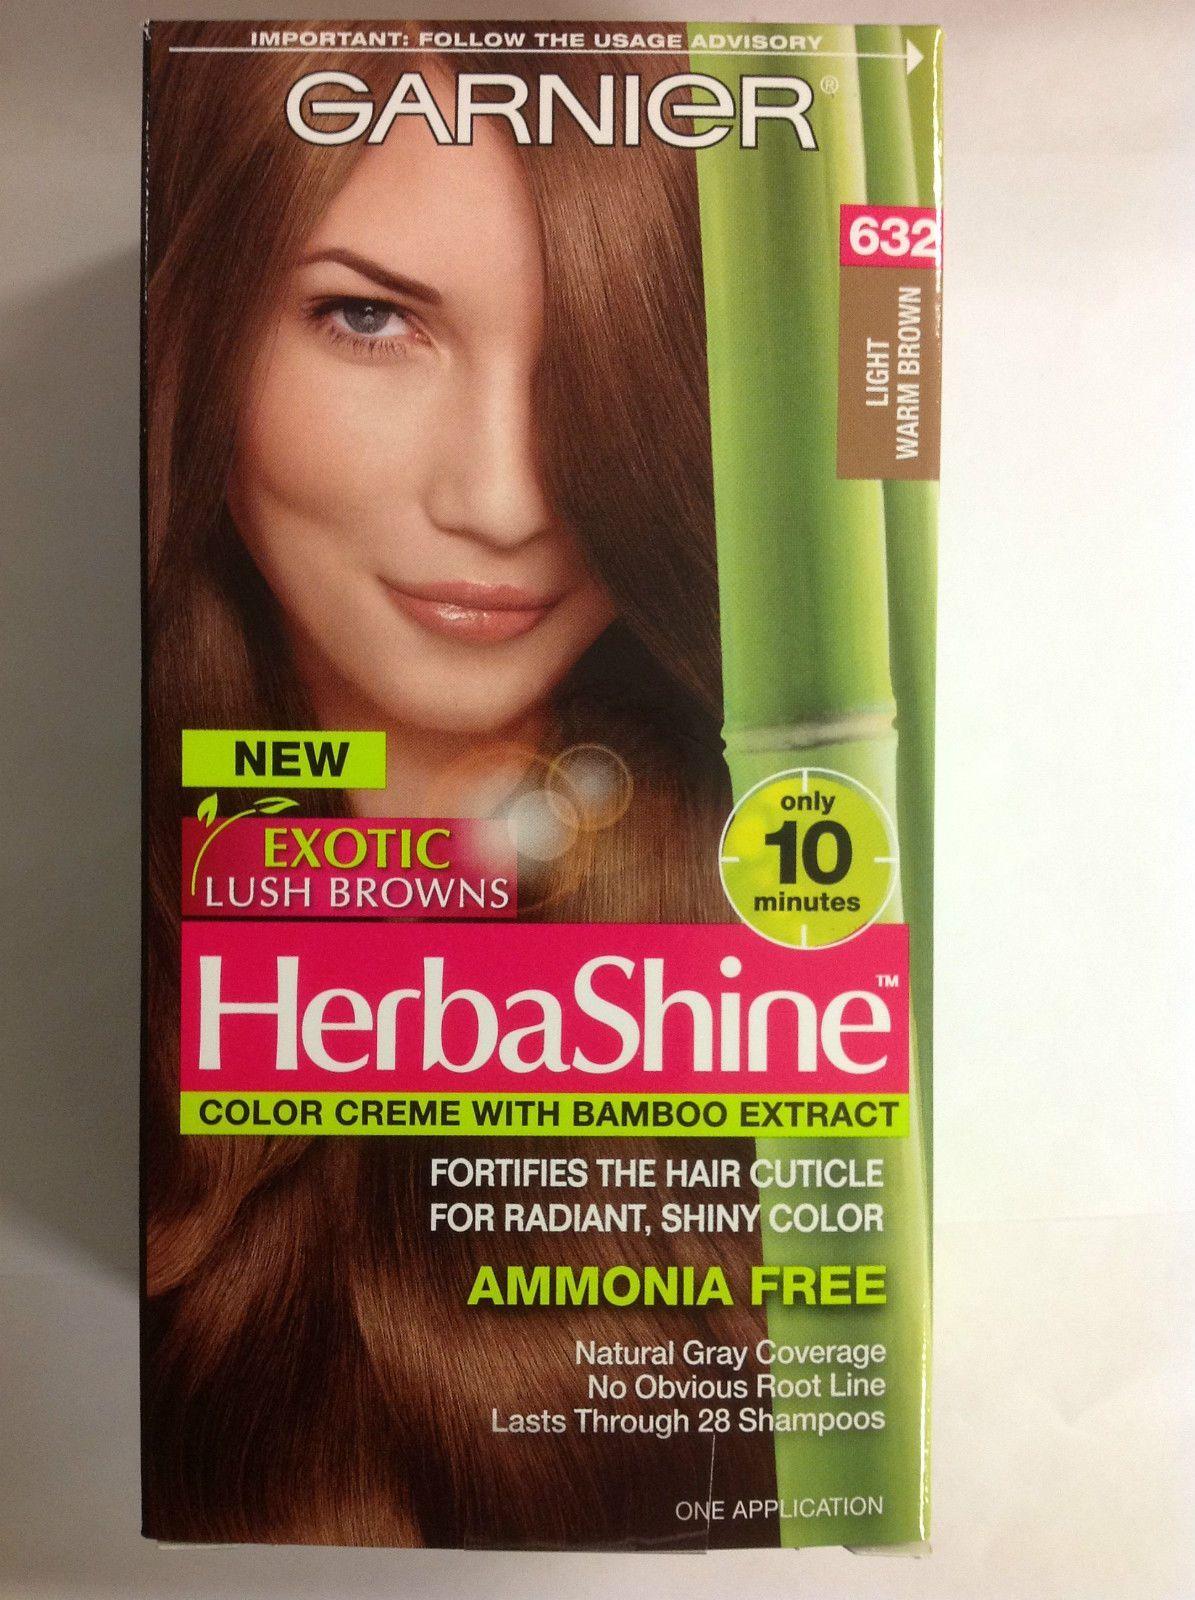 Garnier herbashine haircolor creme 632 light warm brown garnier herbashine haircolor creme 632 light warm brown ammonia free nvjuhfo Image collections